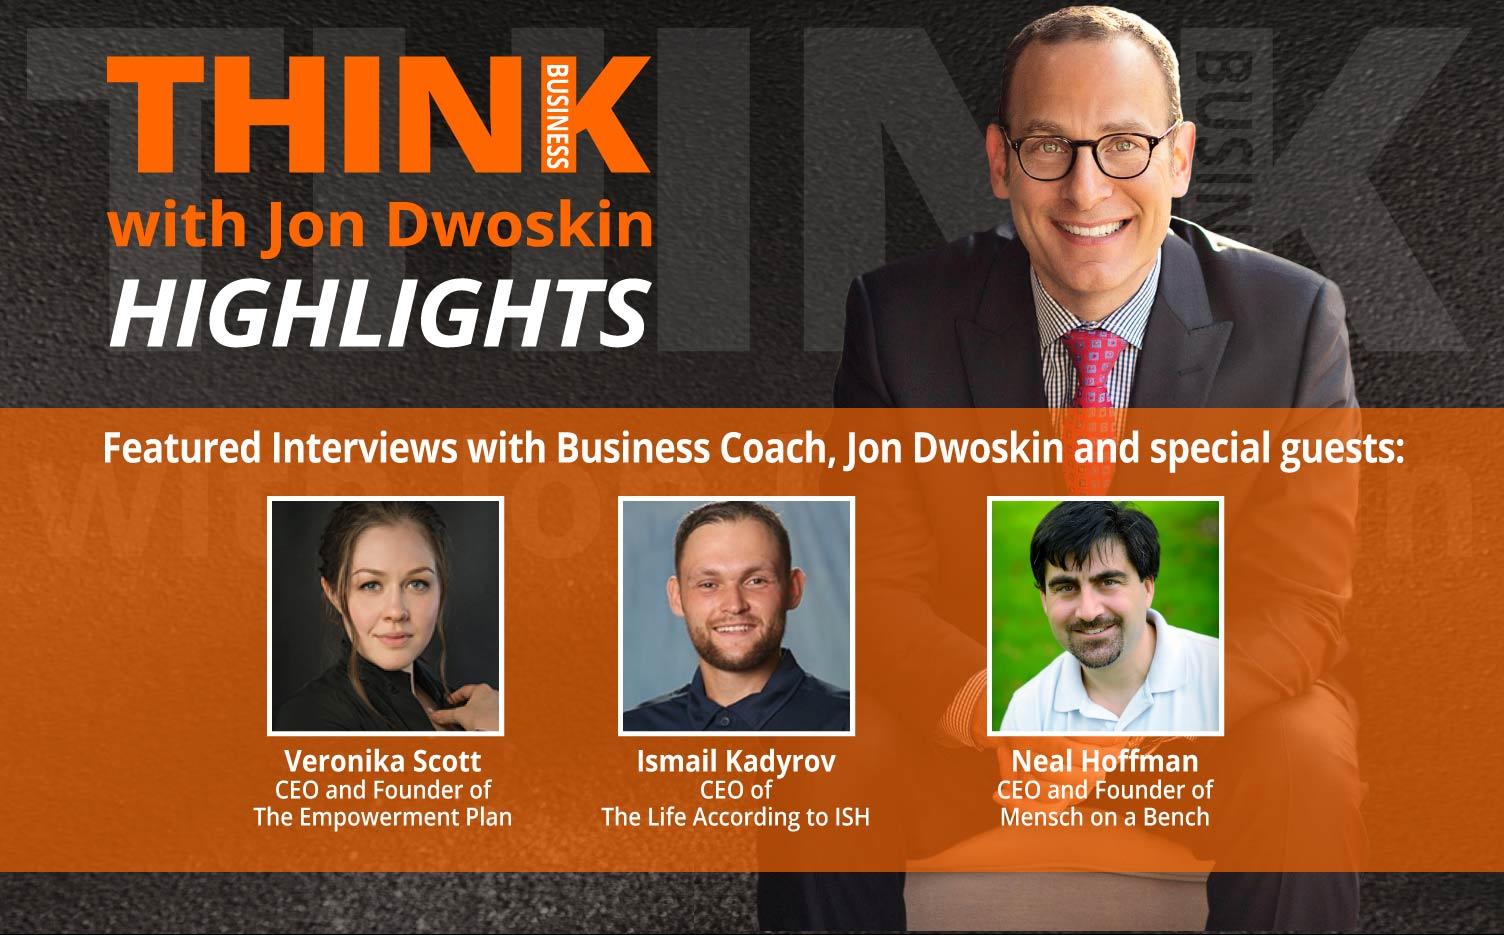 THINK Business: HIGHLIGHTS – Jon Dwoskin Featured Interviews with Veronika Scott, Ismail Kadyrov, Neal Hoffman